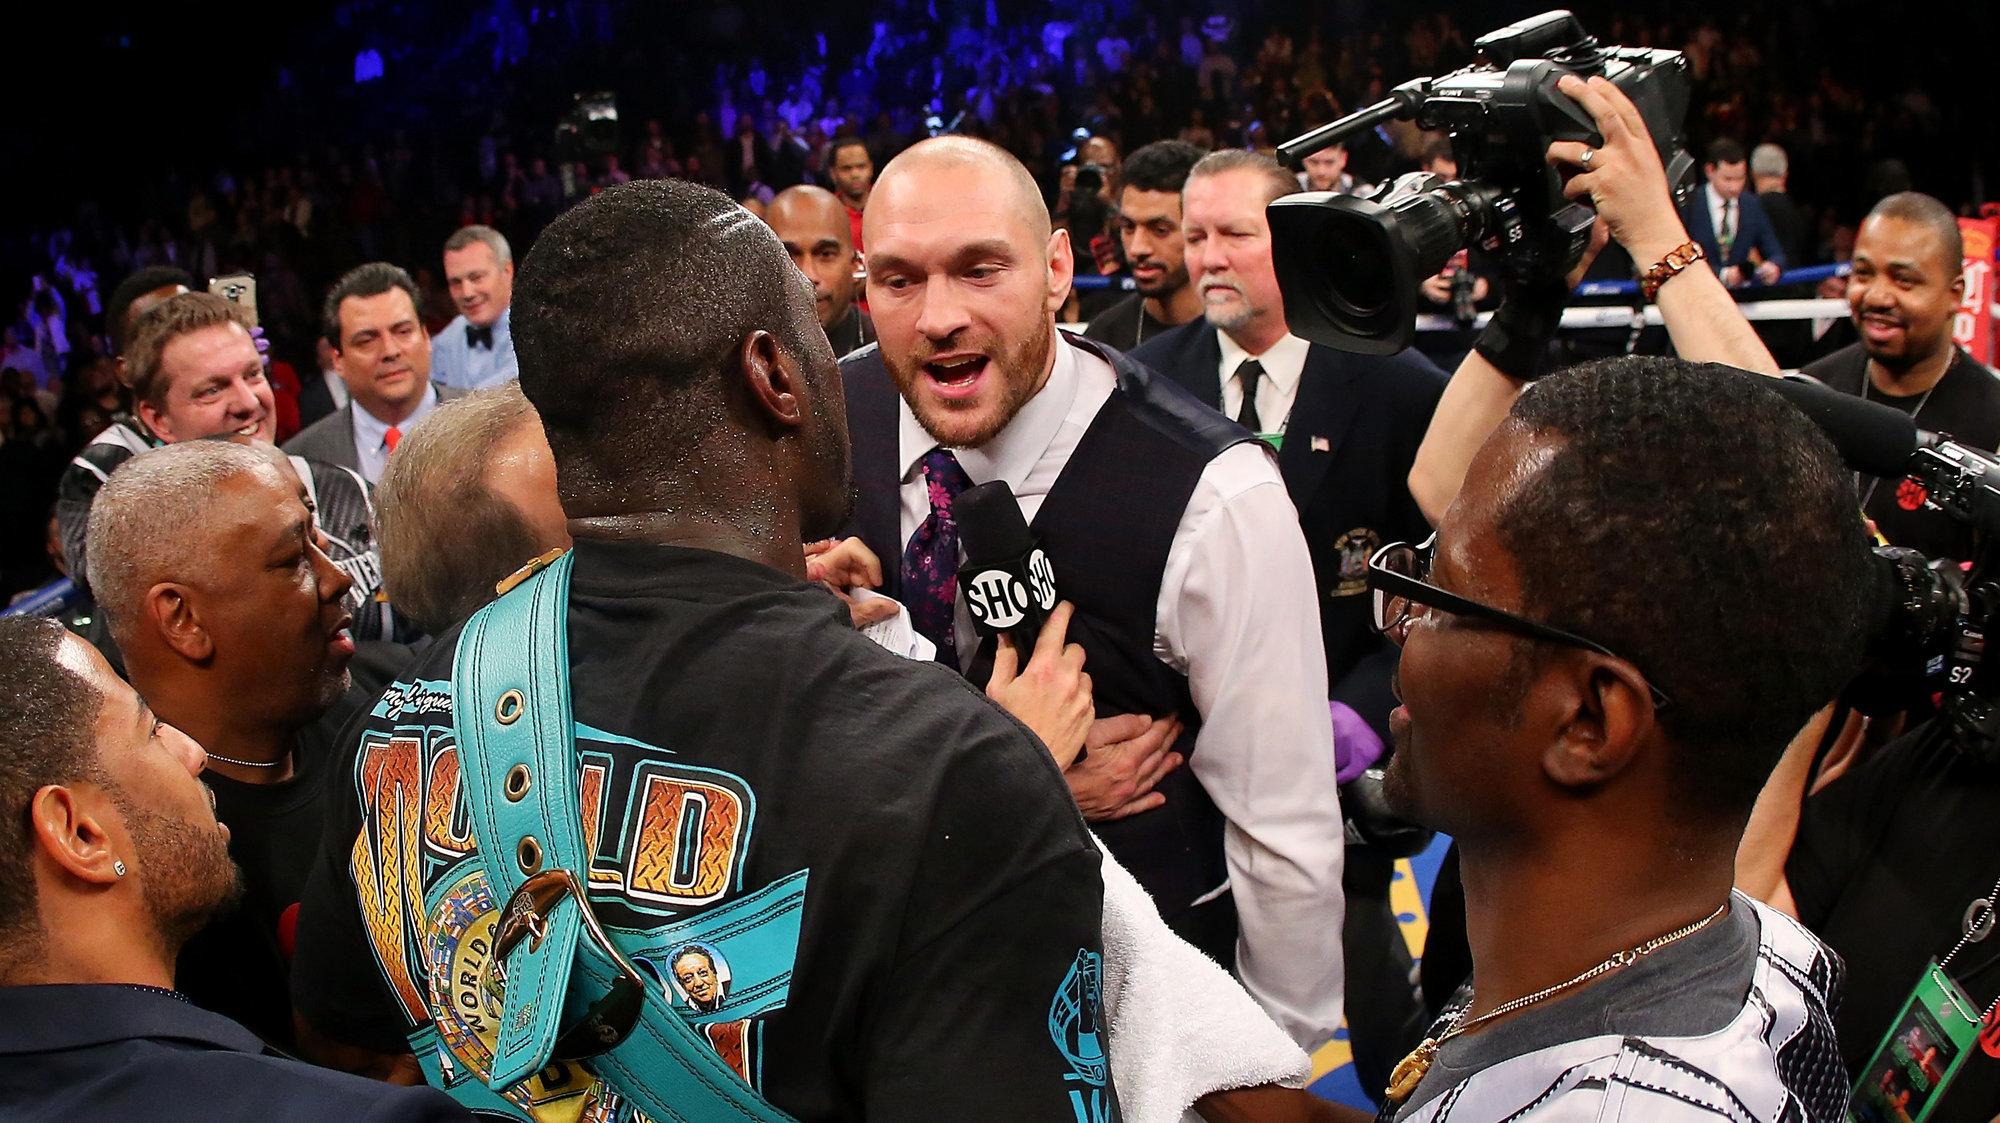 Официально: Тайсон Фьюри отказался от титулов WBA, WBO и IBO